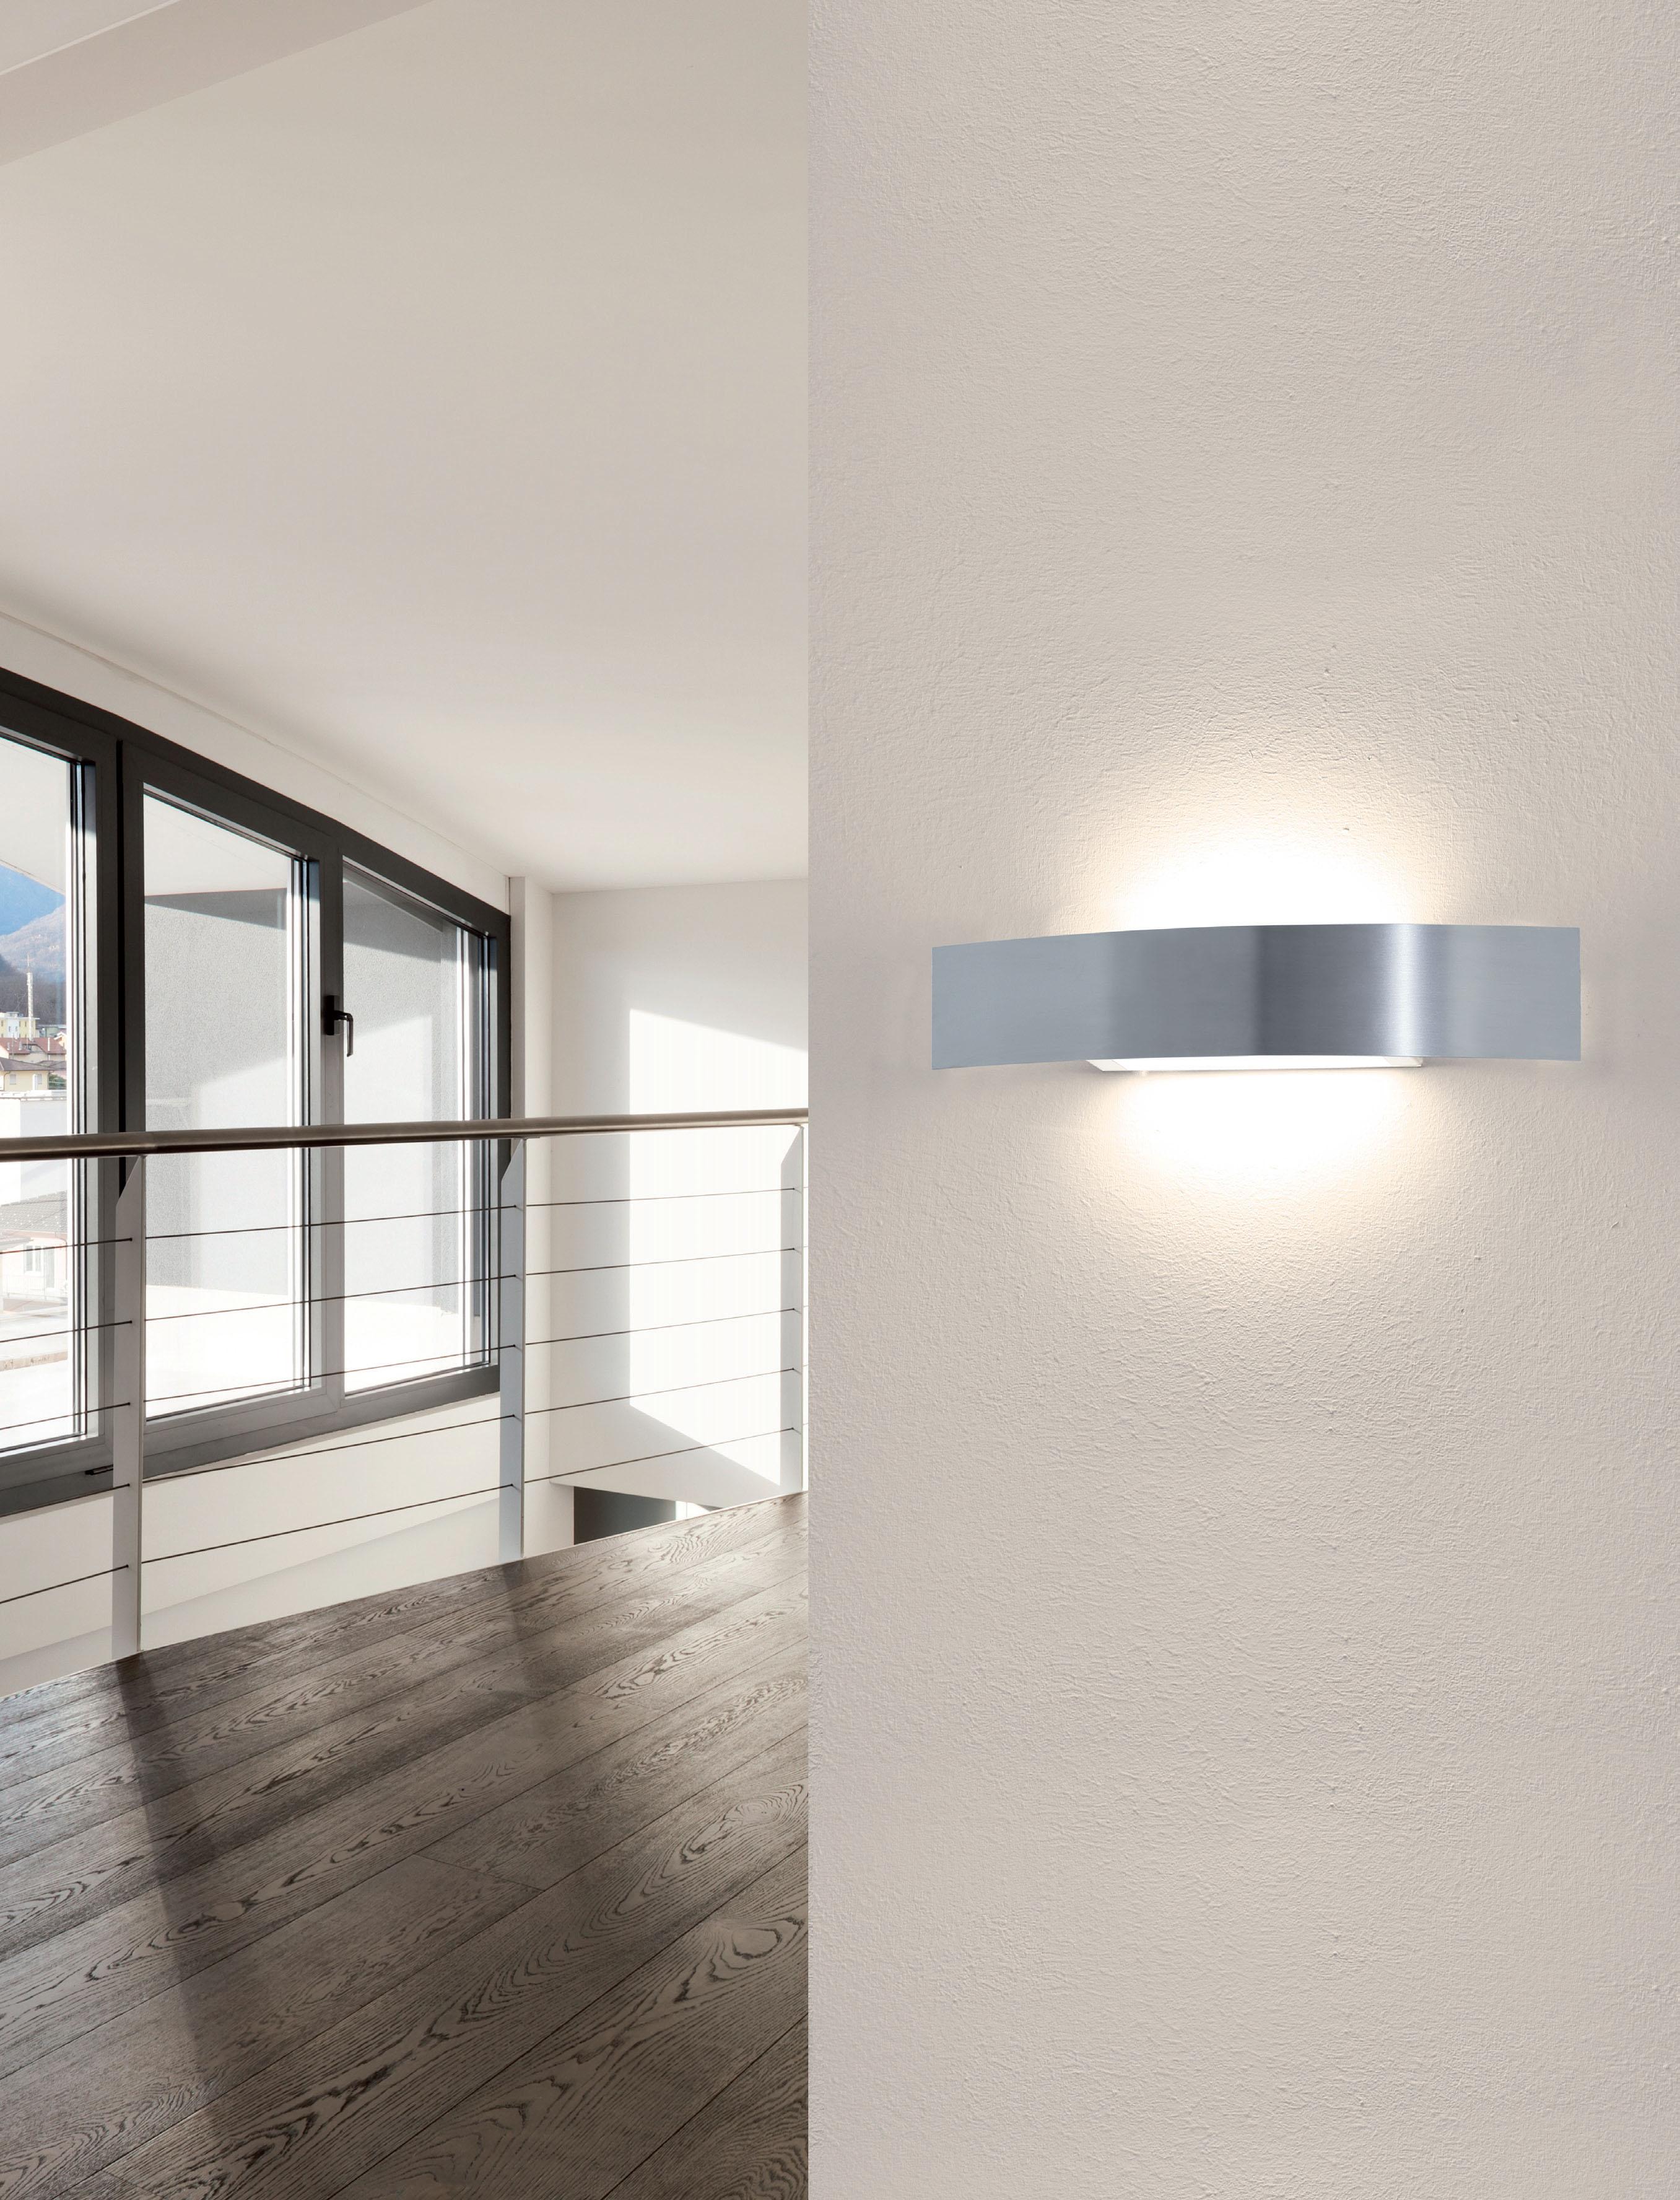 SIkrea Lampada Da Parete CLIP LED/NS - Notali Lampadari